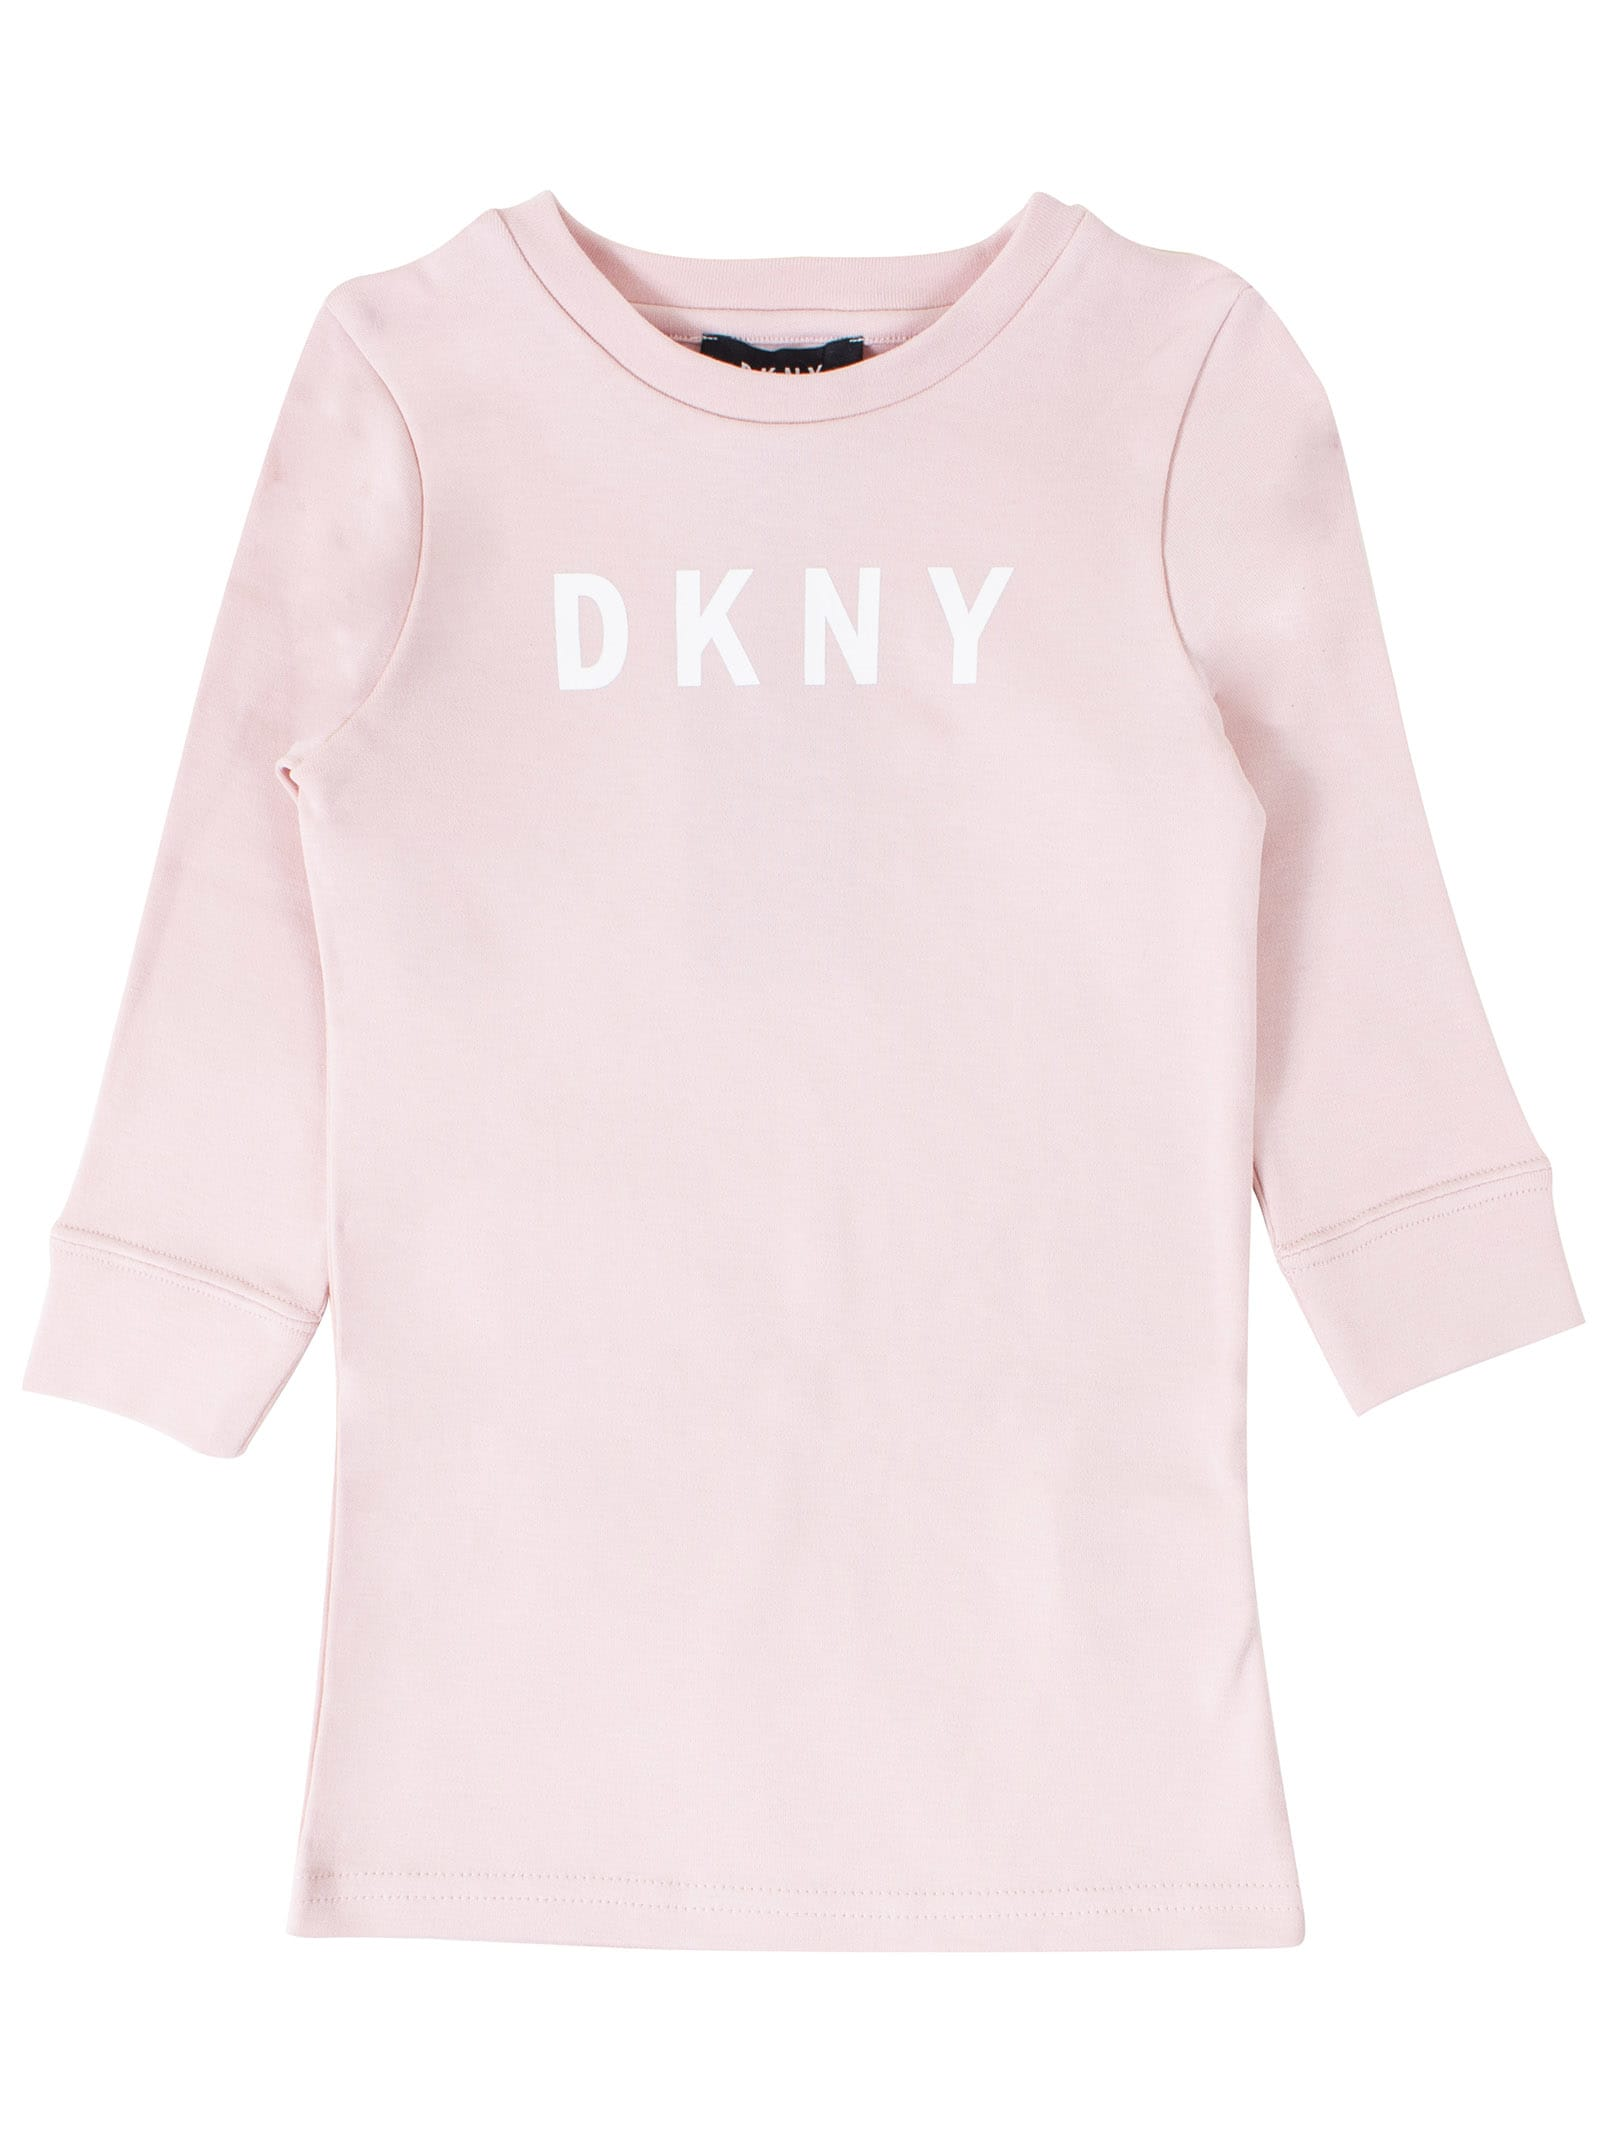 DKNY Baby Girl Dress